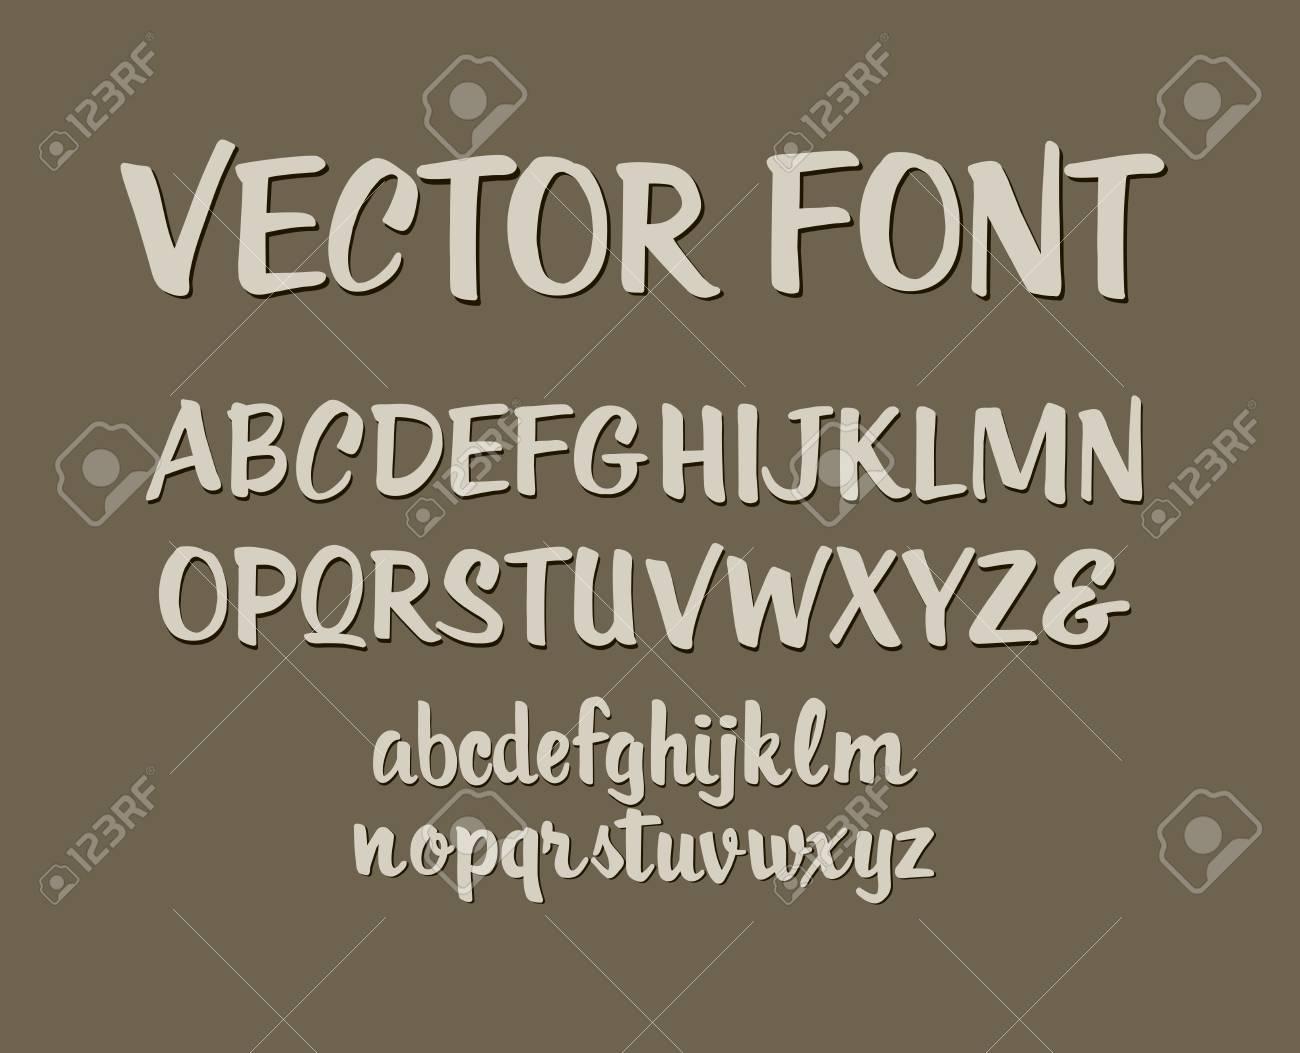 Handwritten Alphabet Letters Design Royalty Free Cliparts Vectors